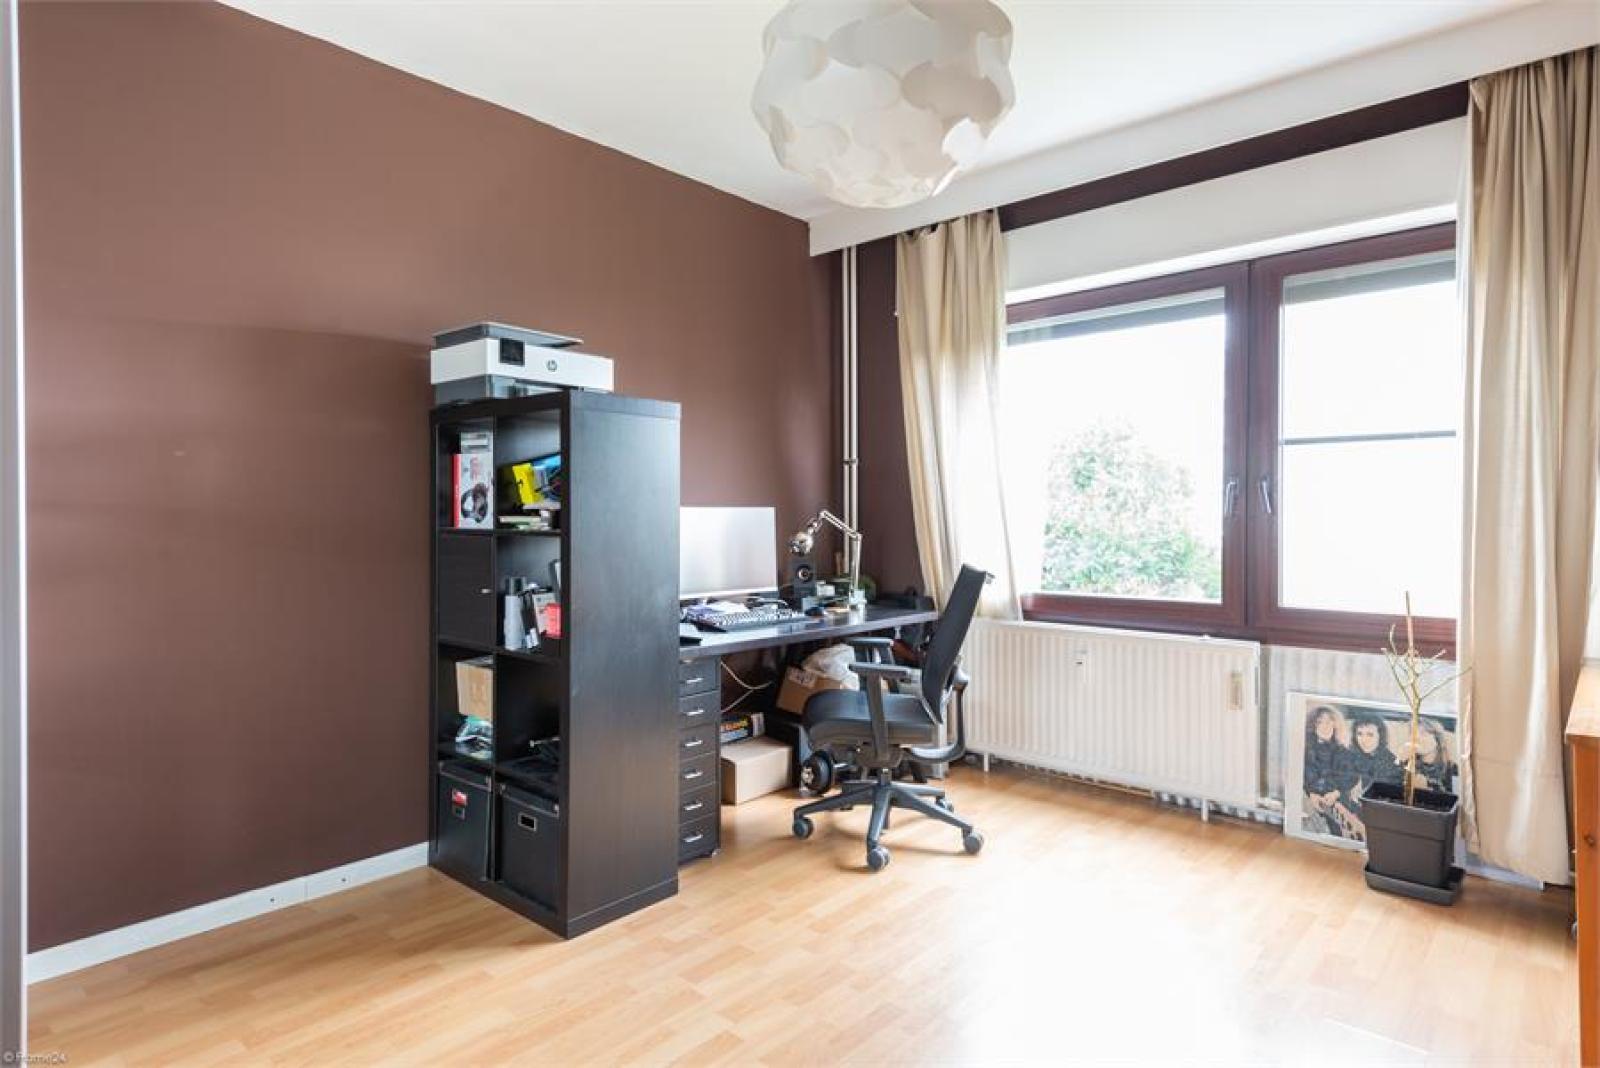 Instapklaar appartement (77 m²) met twee slaapkamers op centrale ligging te Deurne! afbeelding 14